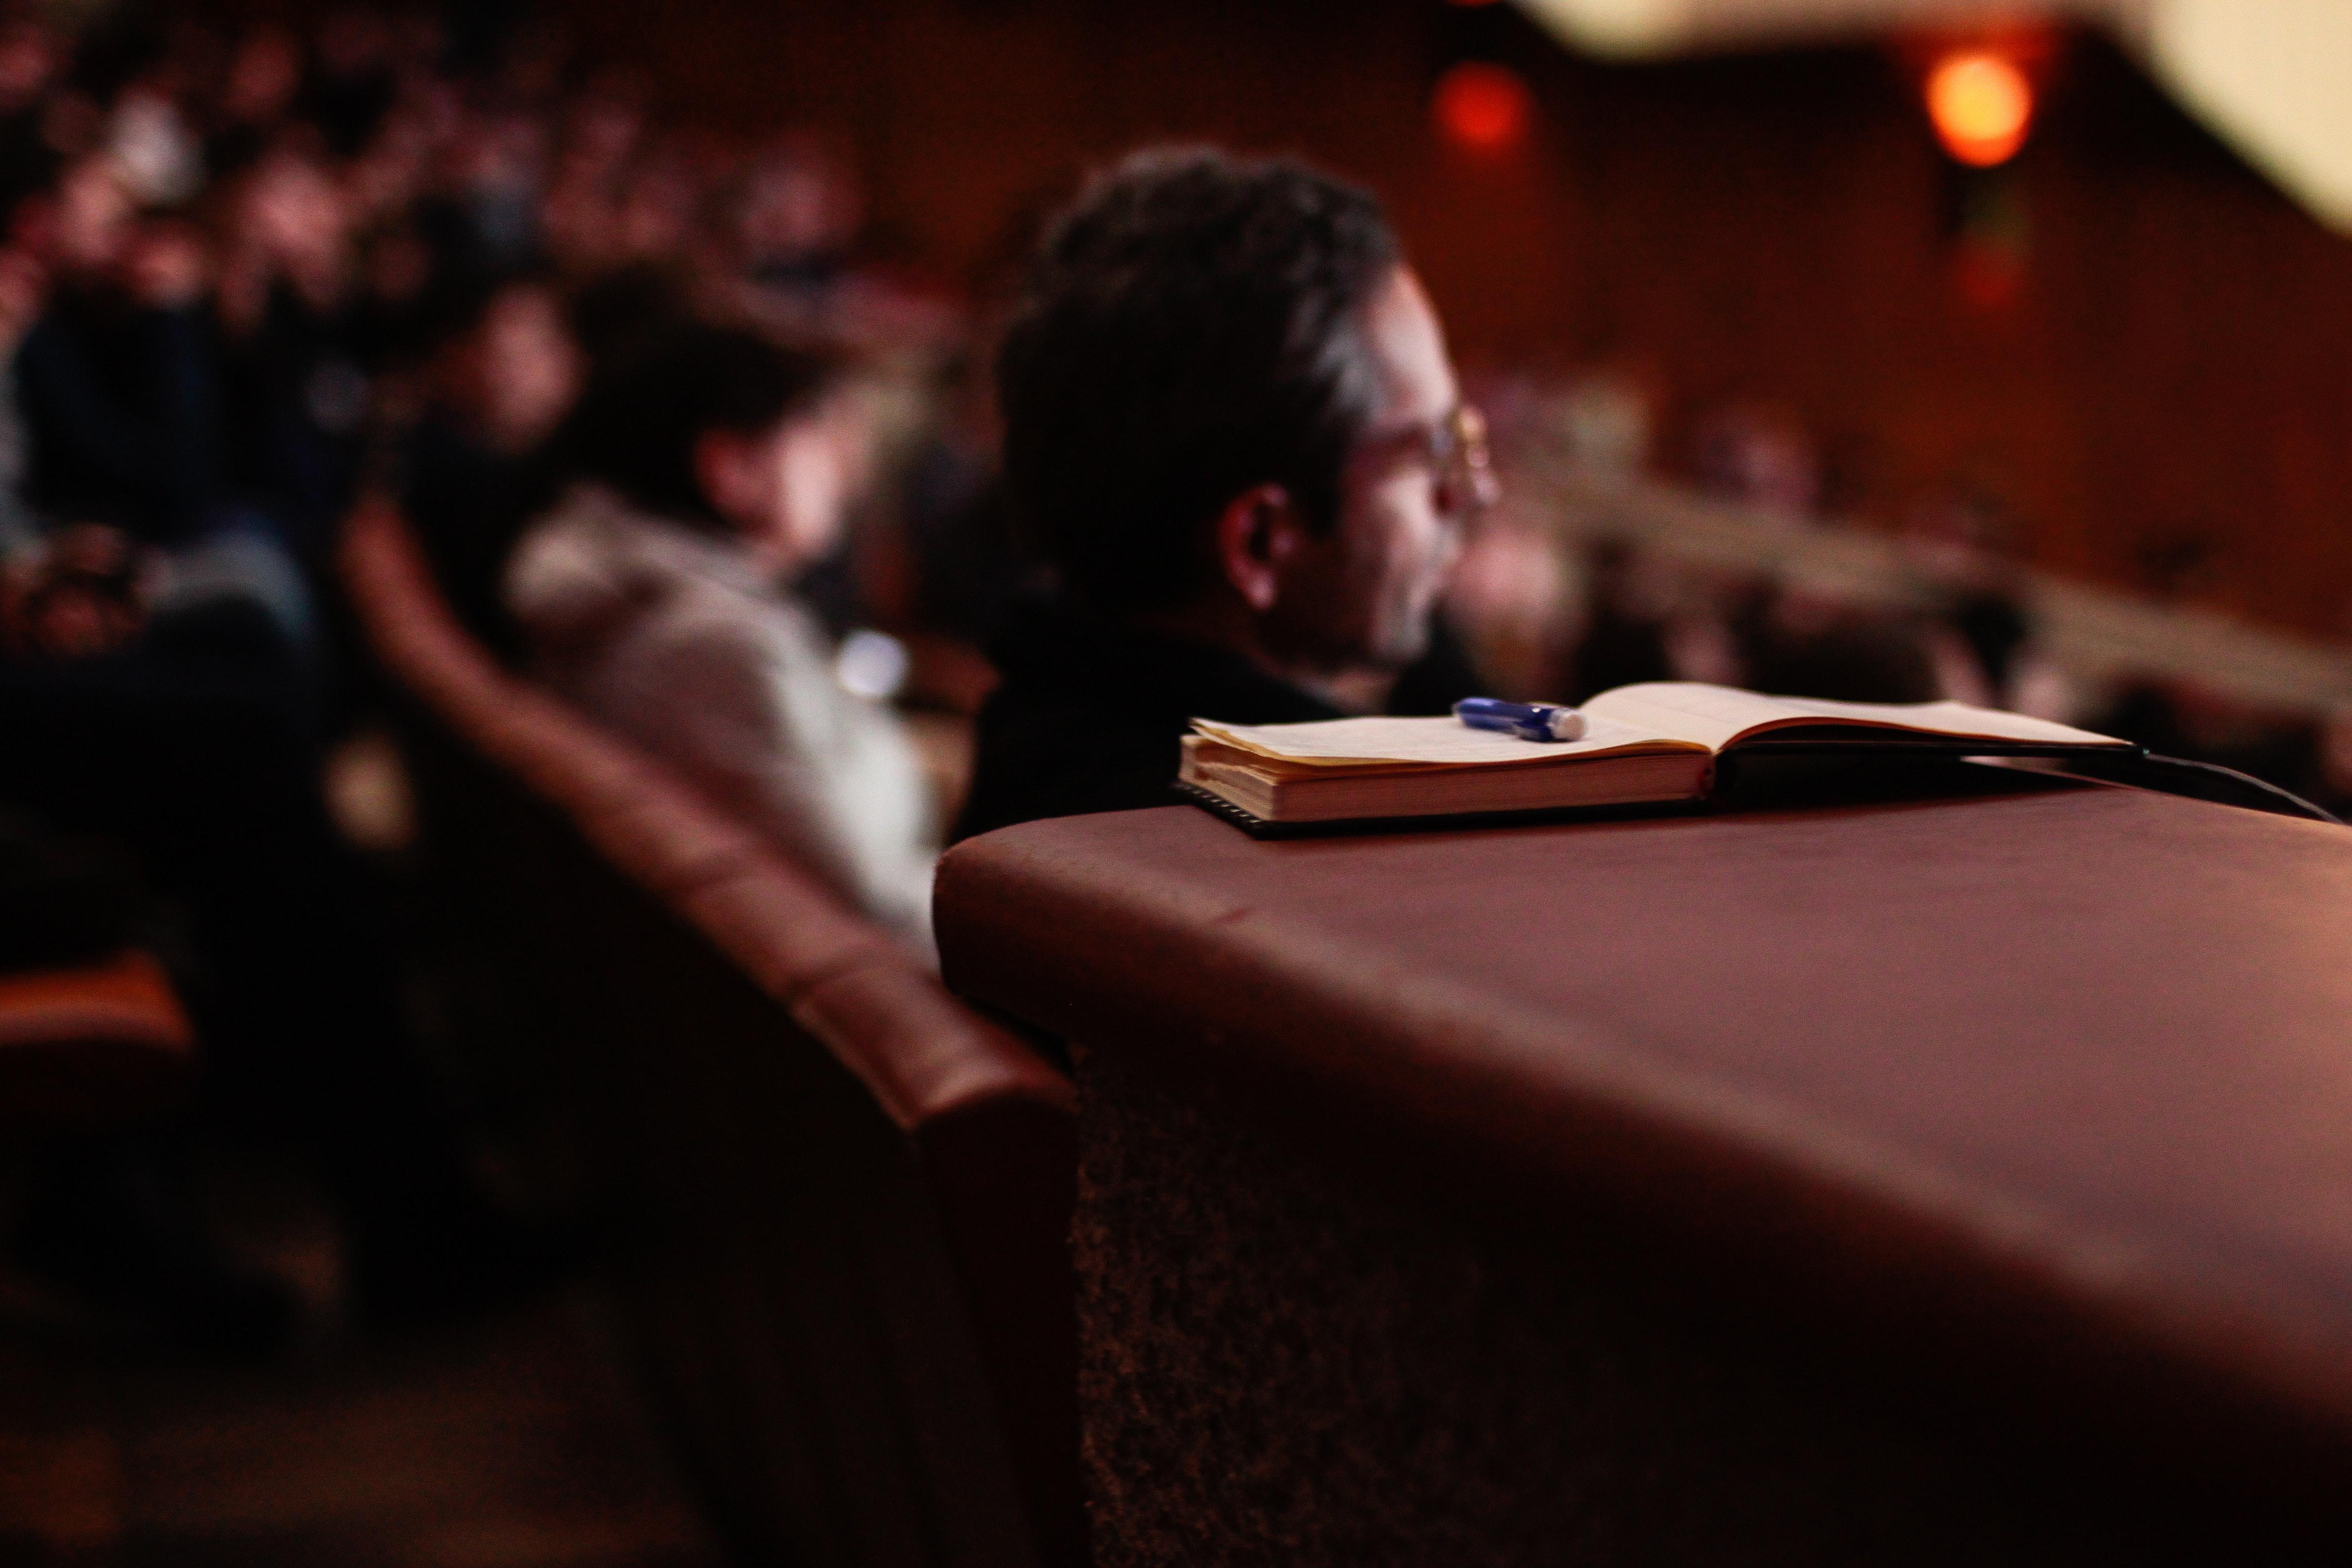 audience-auditorium-bible-301988.jpg